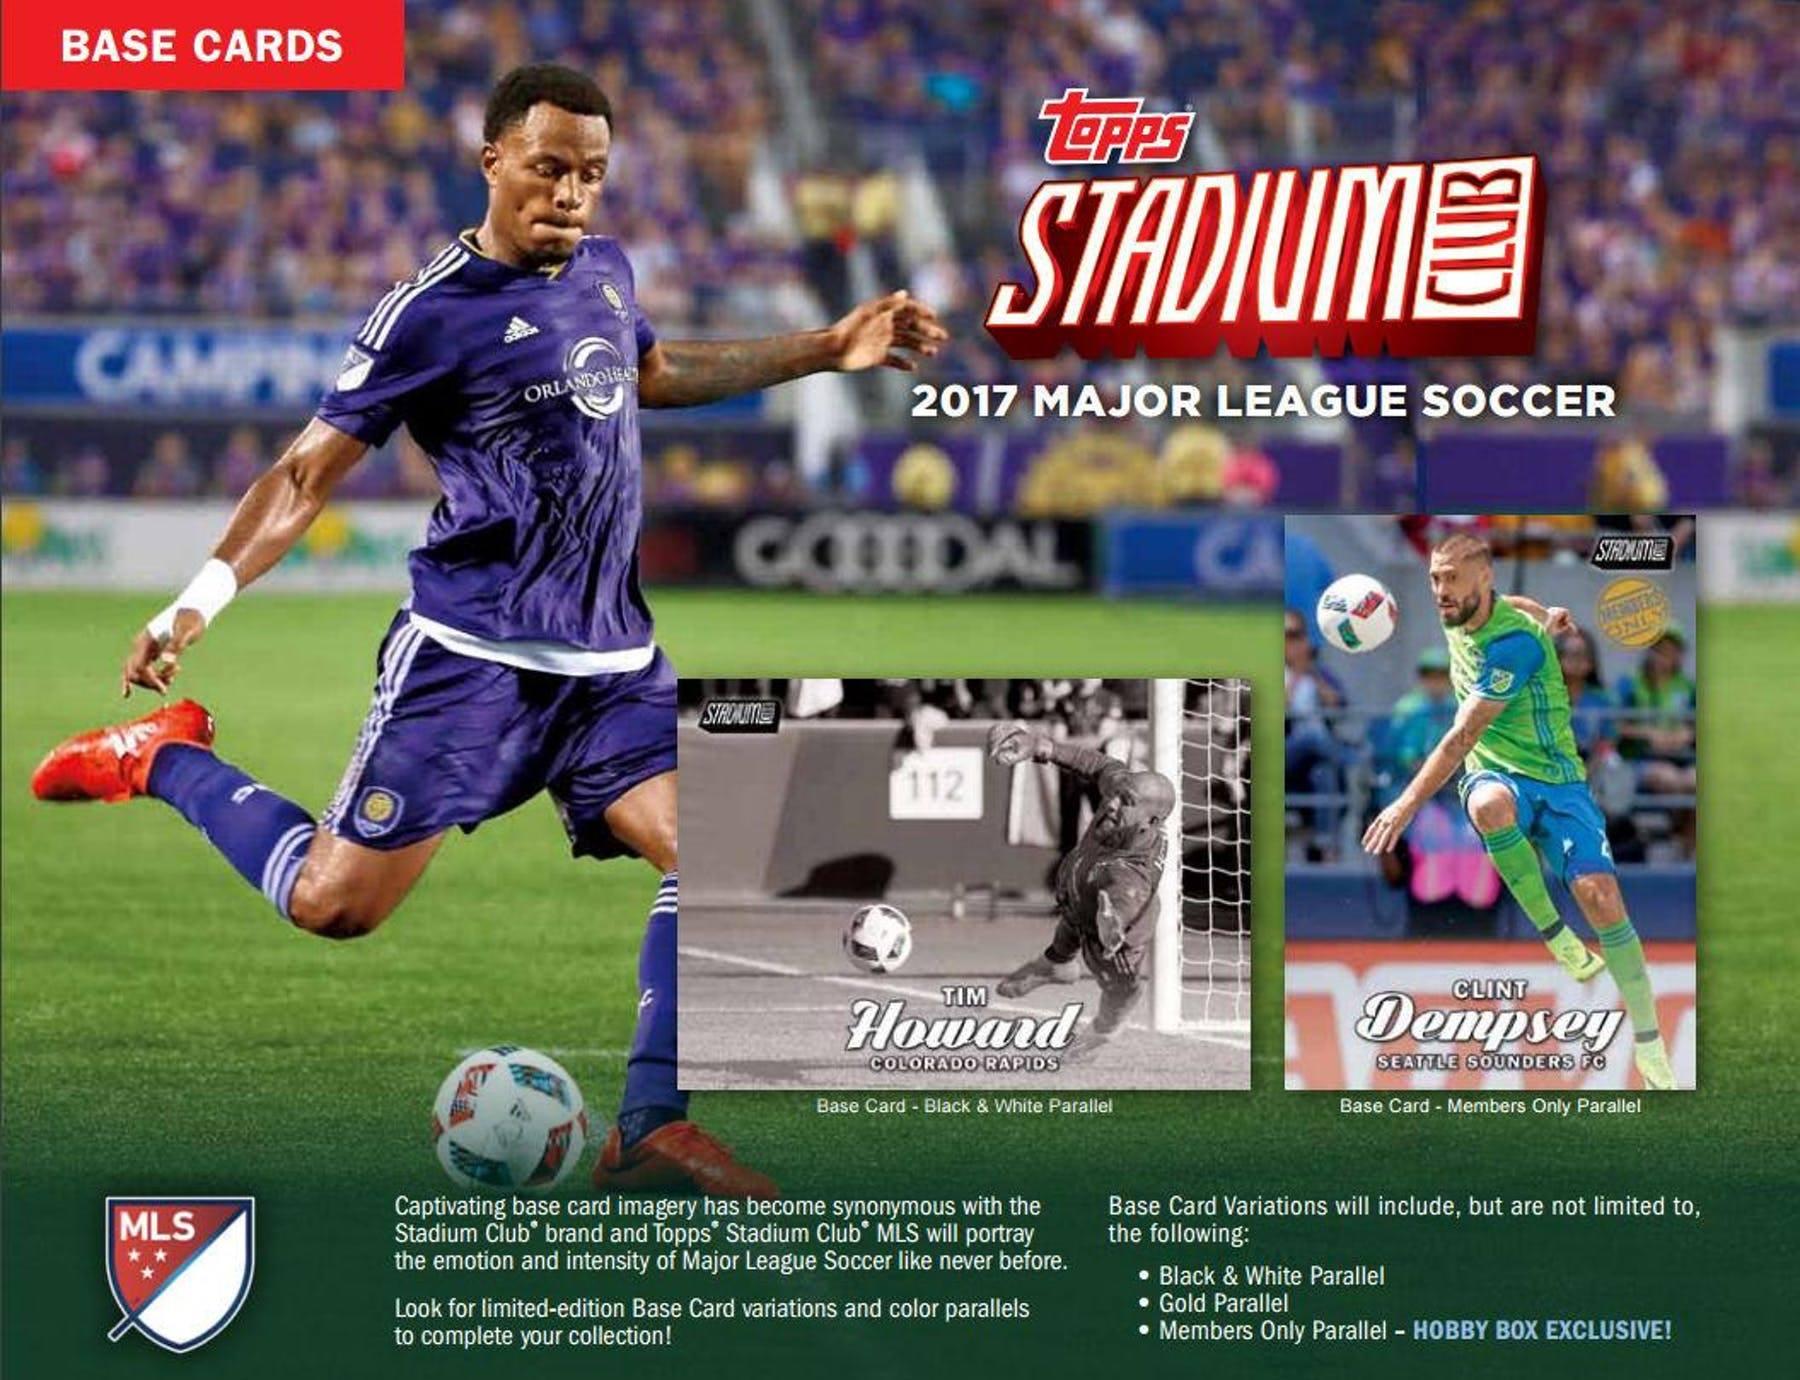 mls_stadium_2.jpg